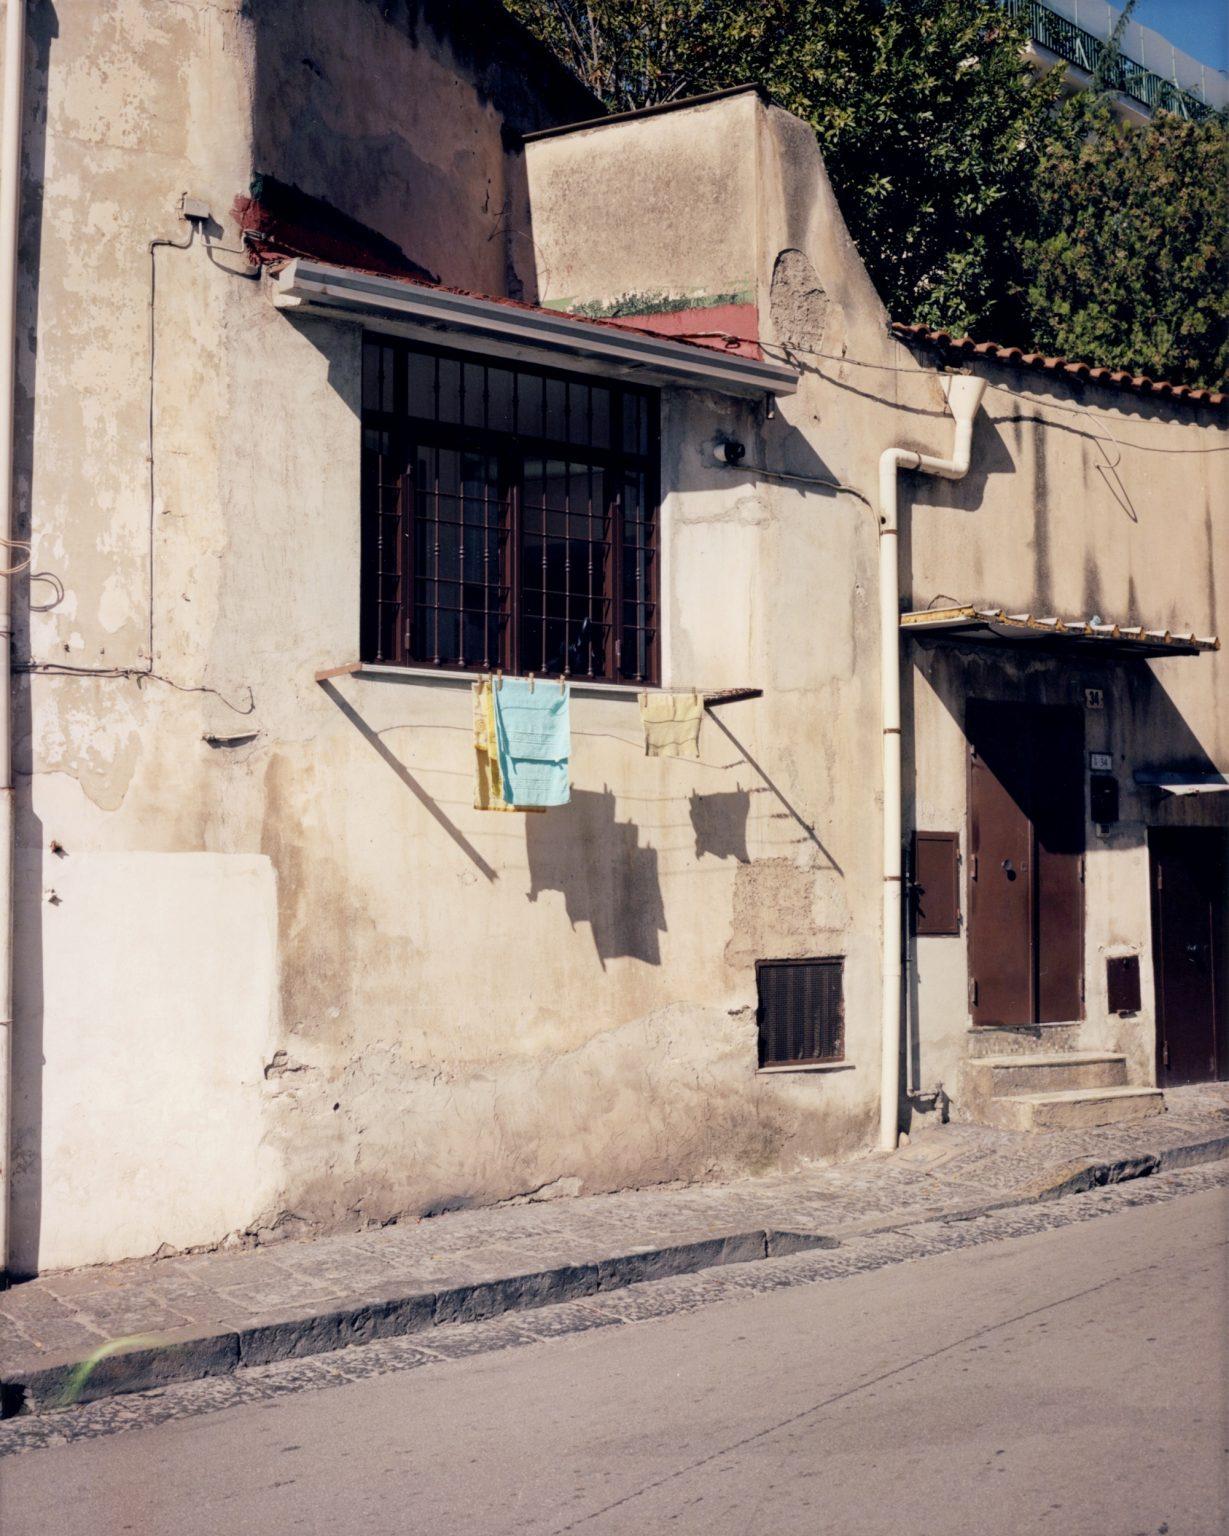 Rags hanging in the sun. Paesi Vesuviani, Province of Naples. 2020